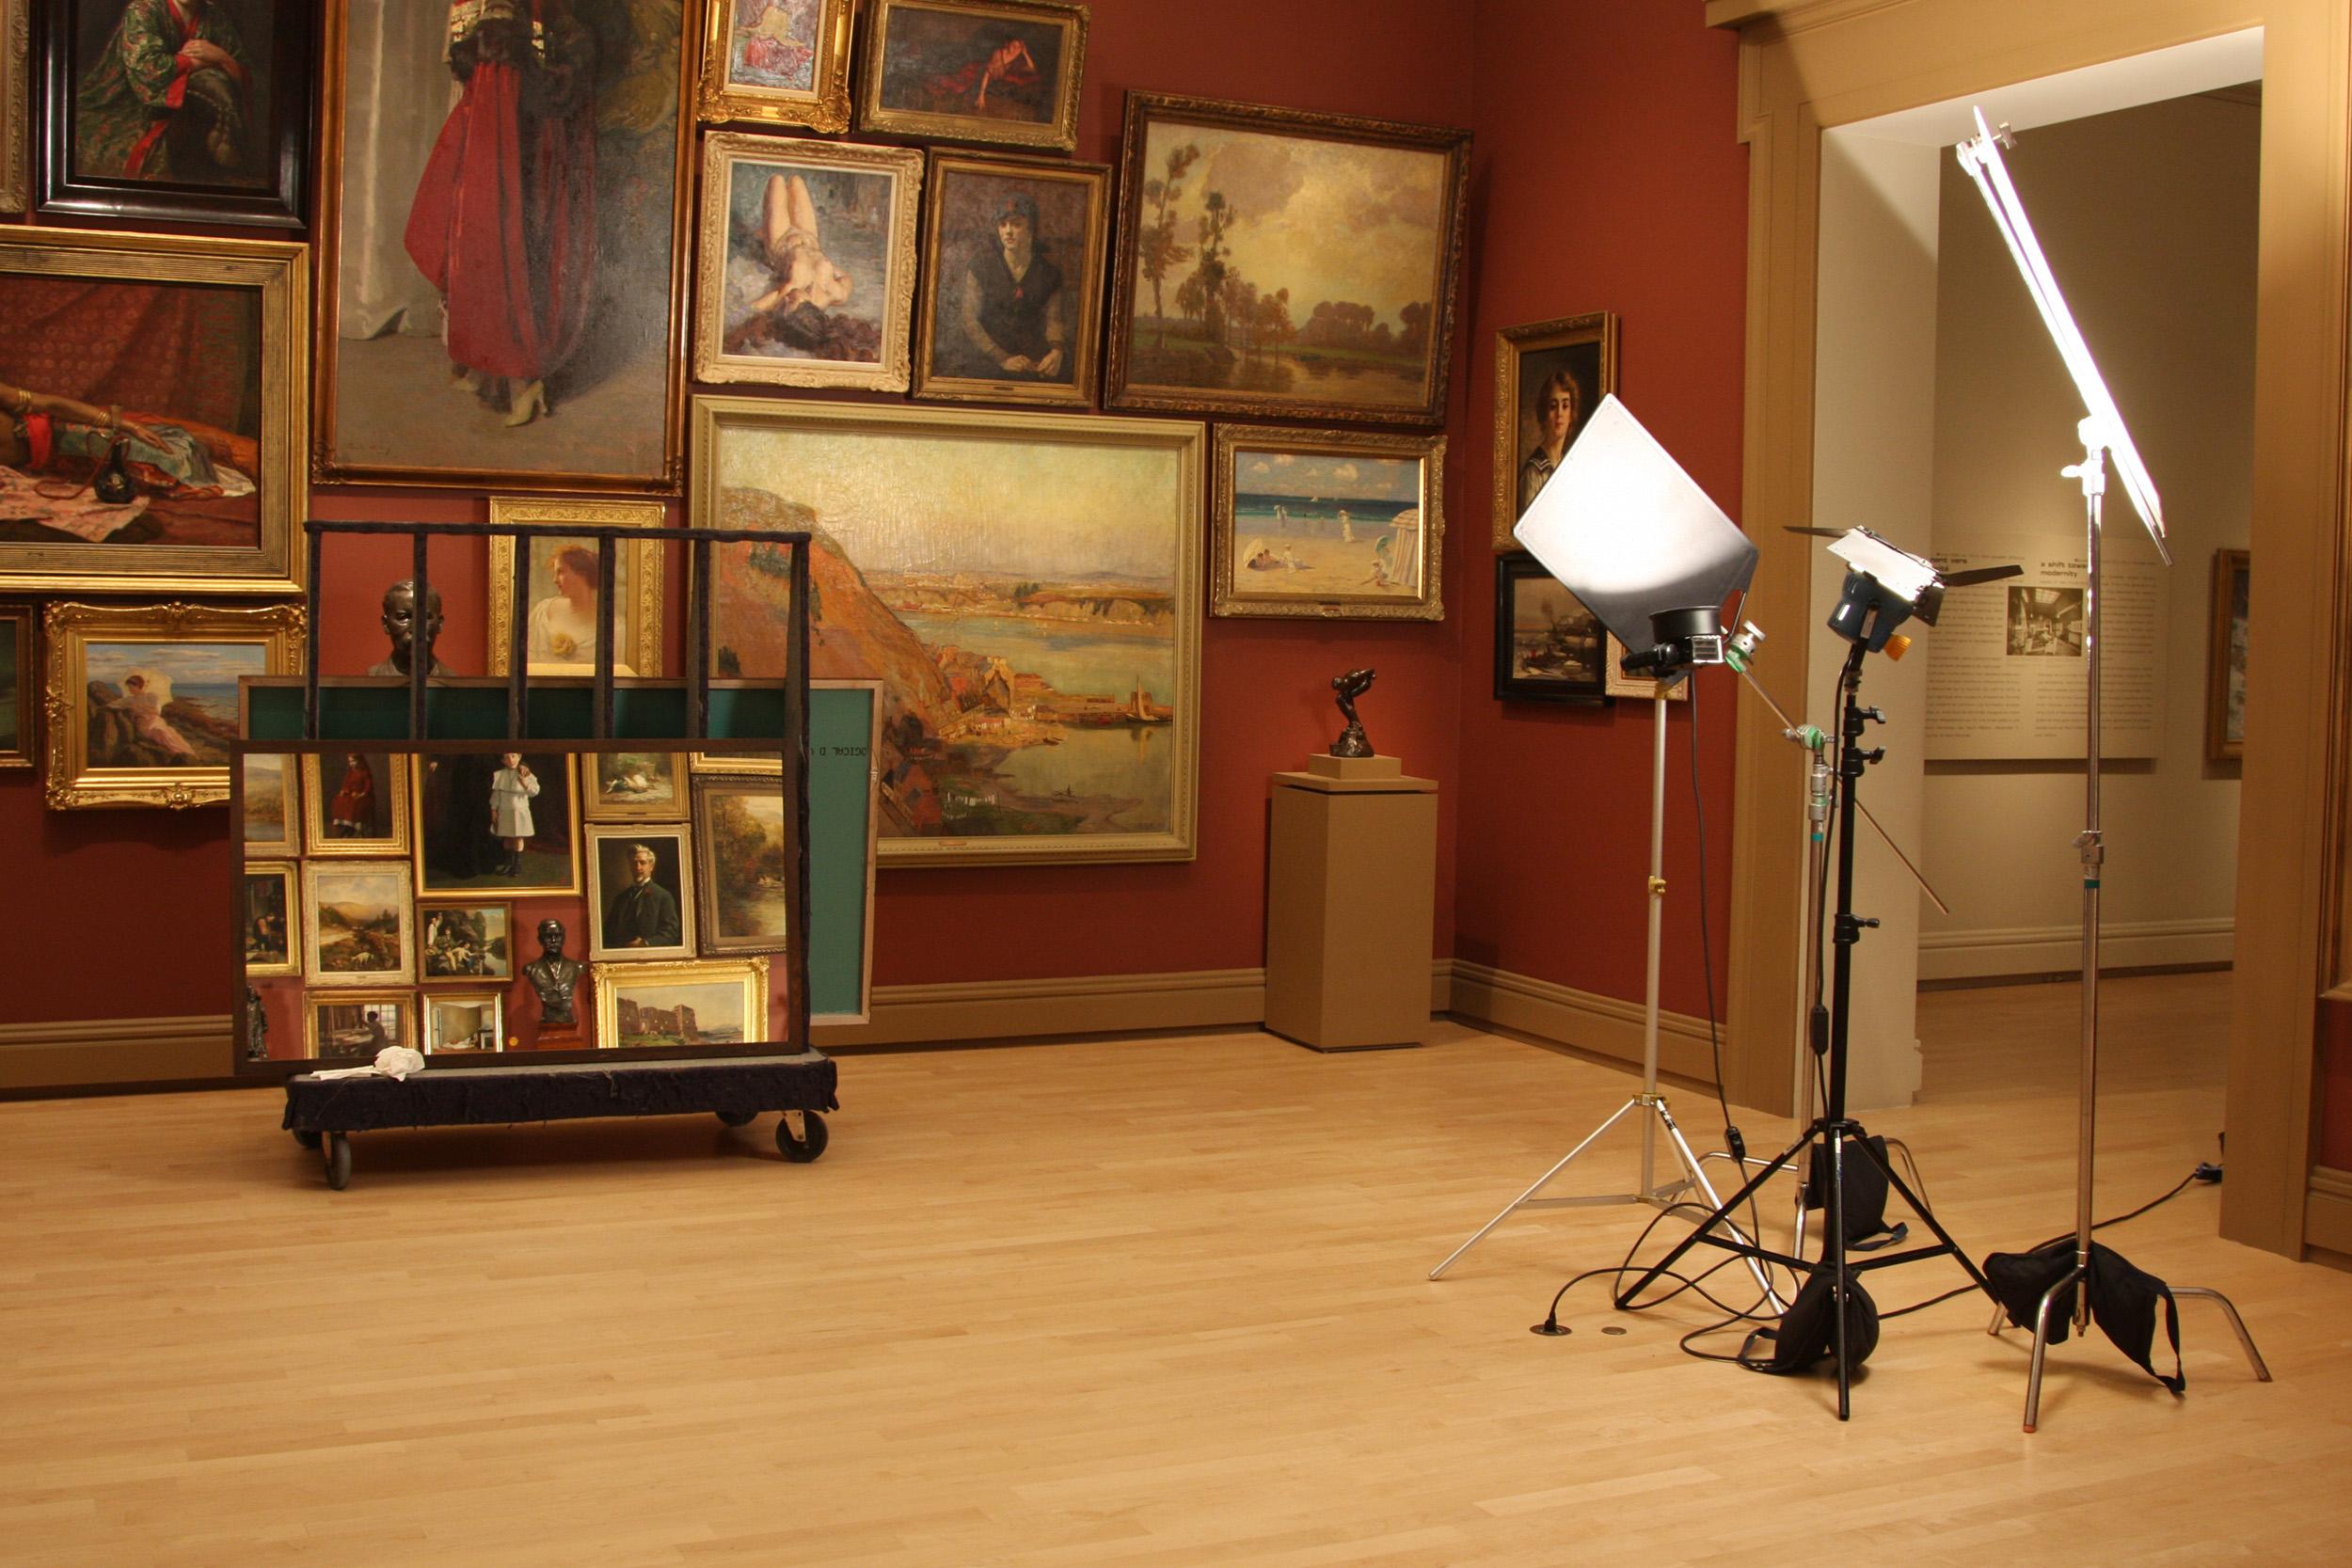 2008_Mirroring_The_Musee_Making_Of_2.jpg